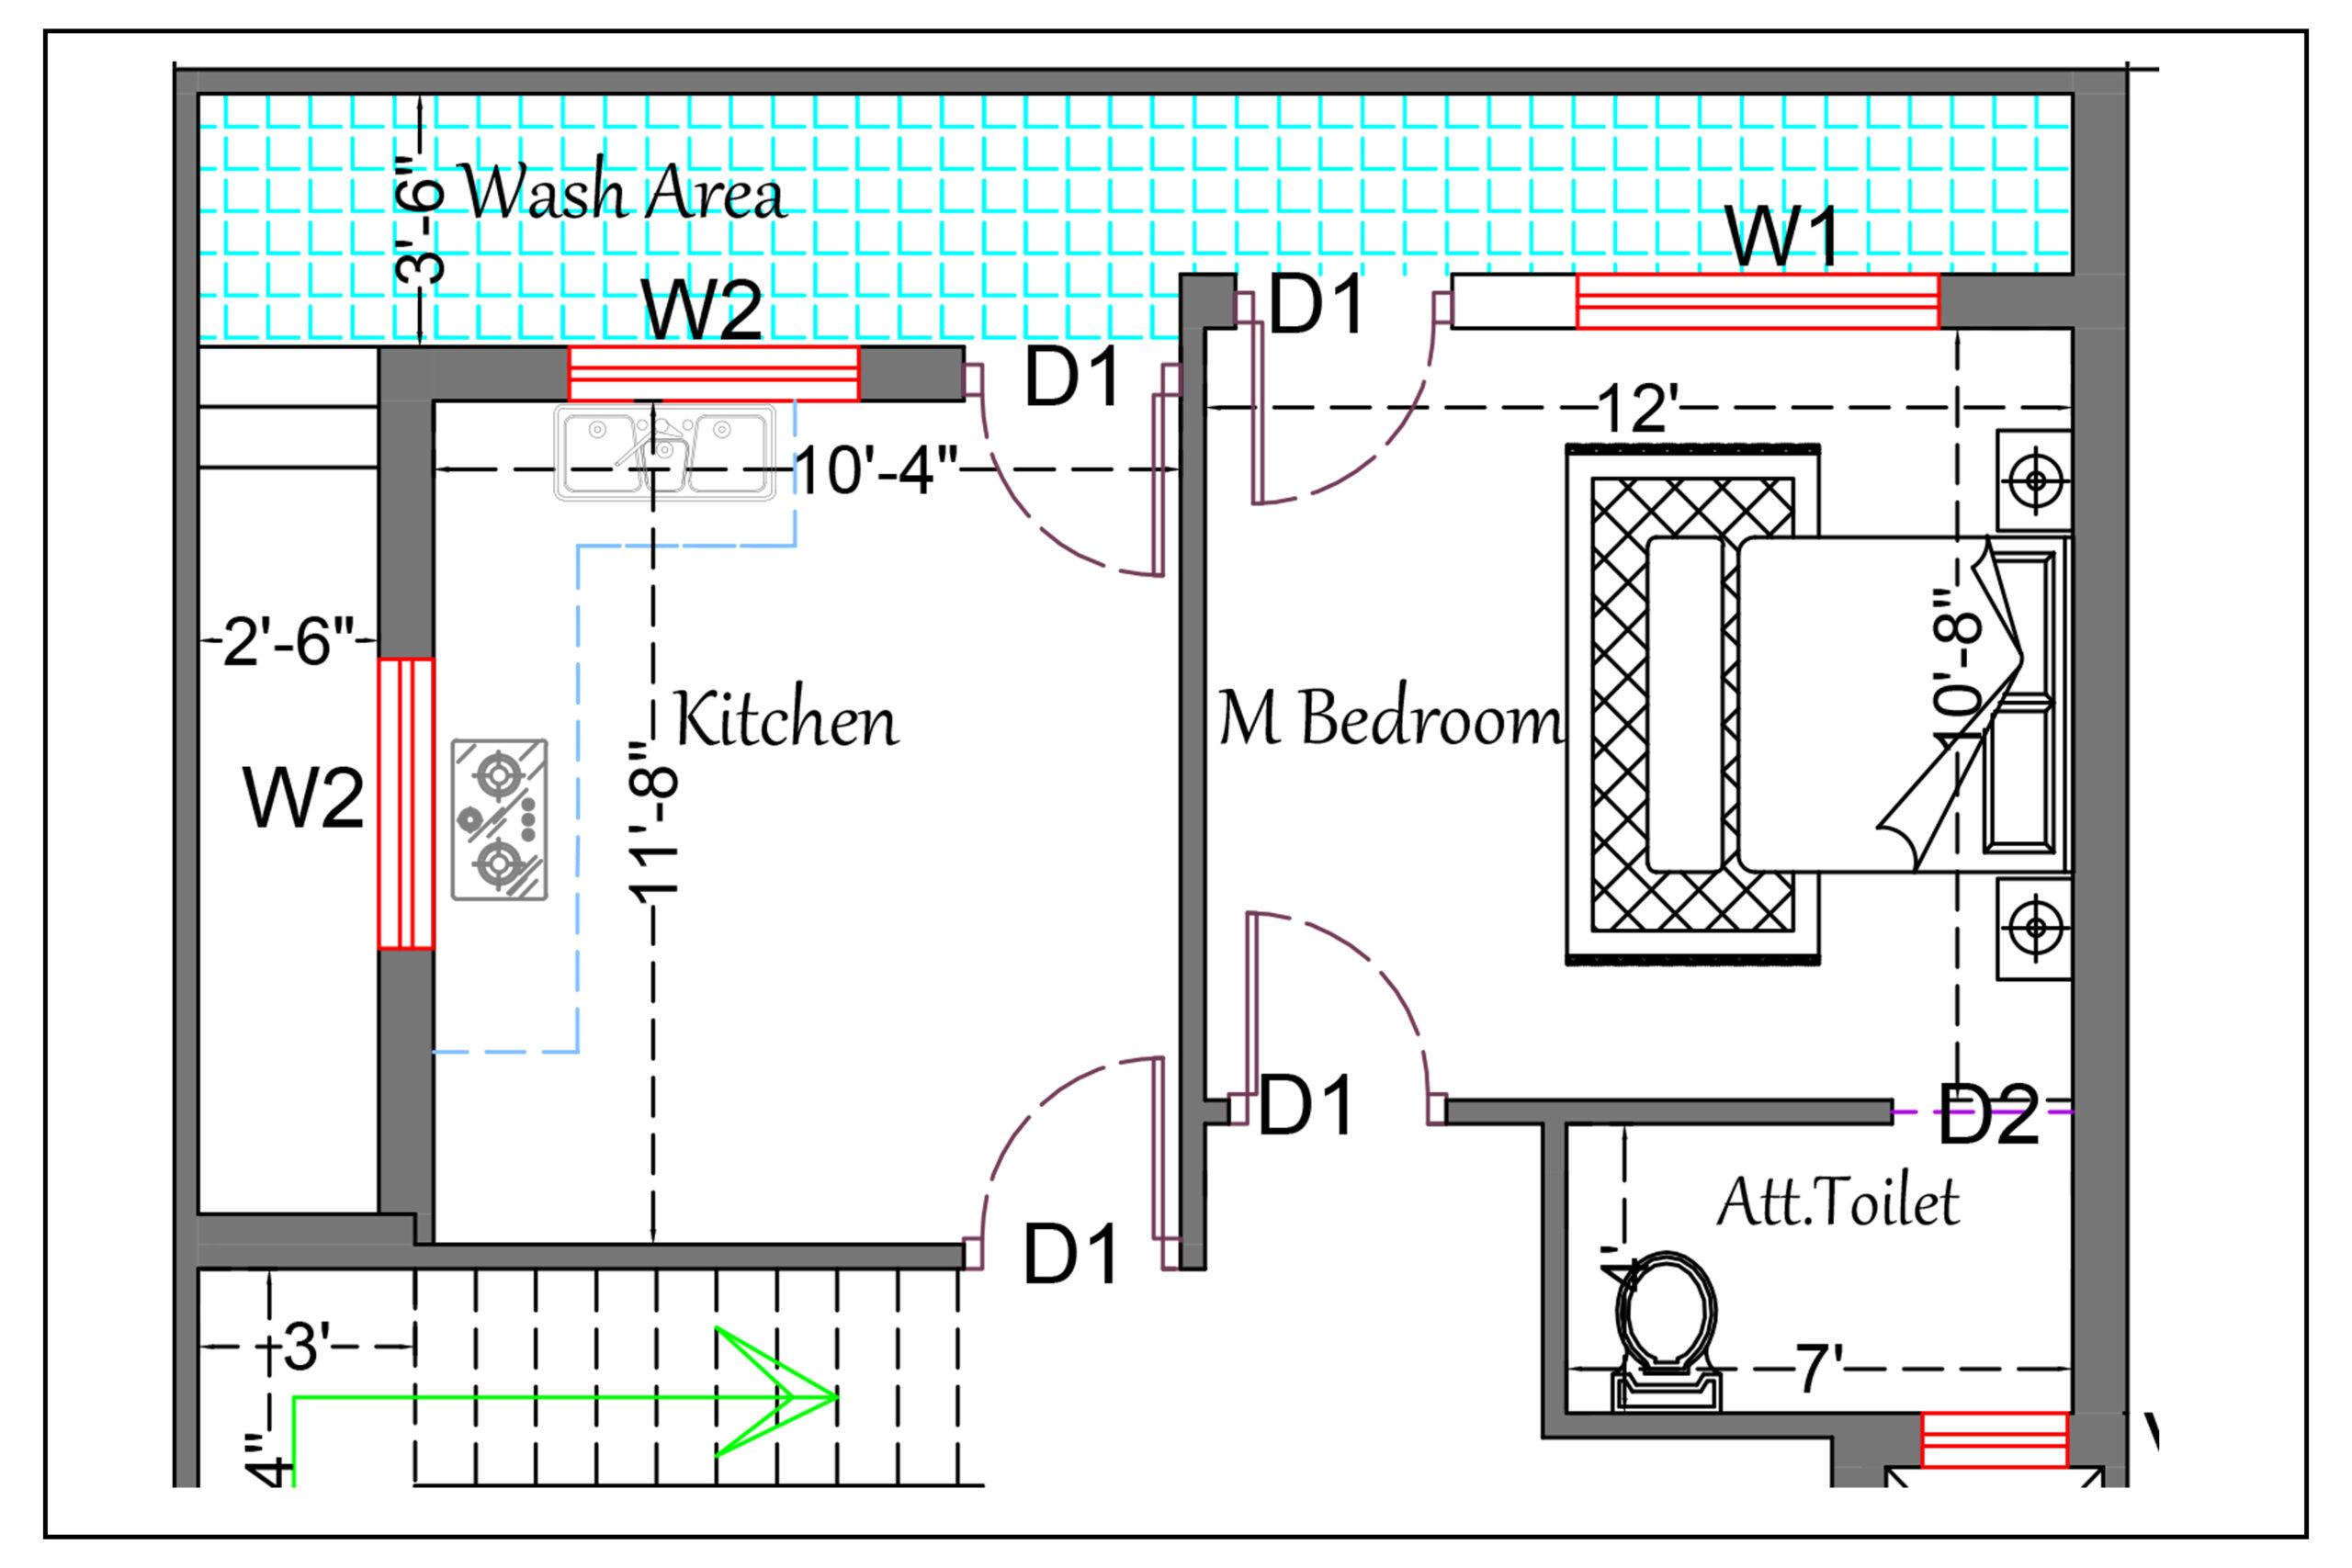 South Facing House Plan